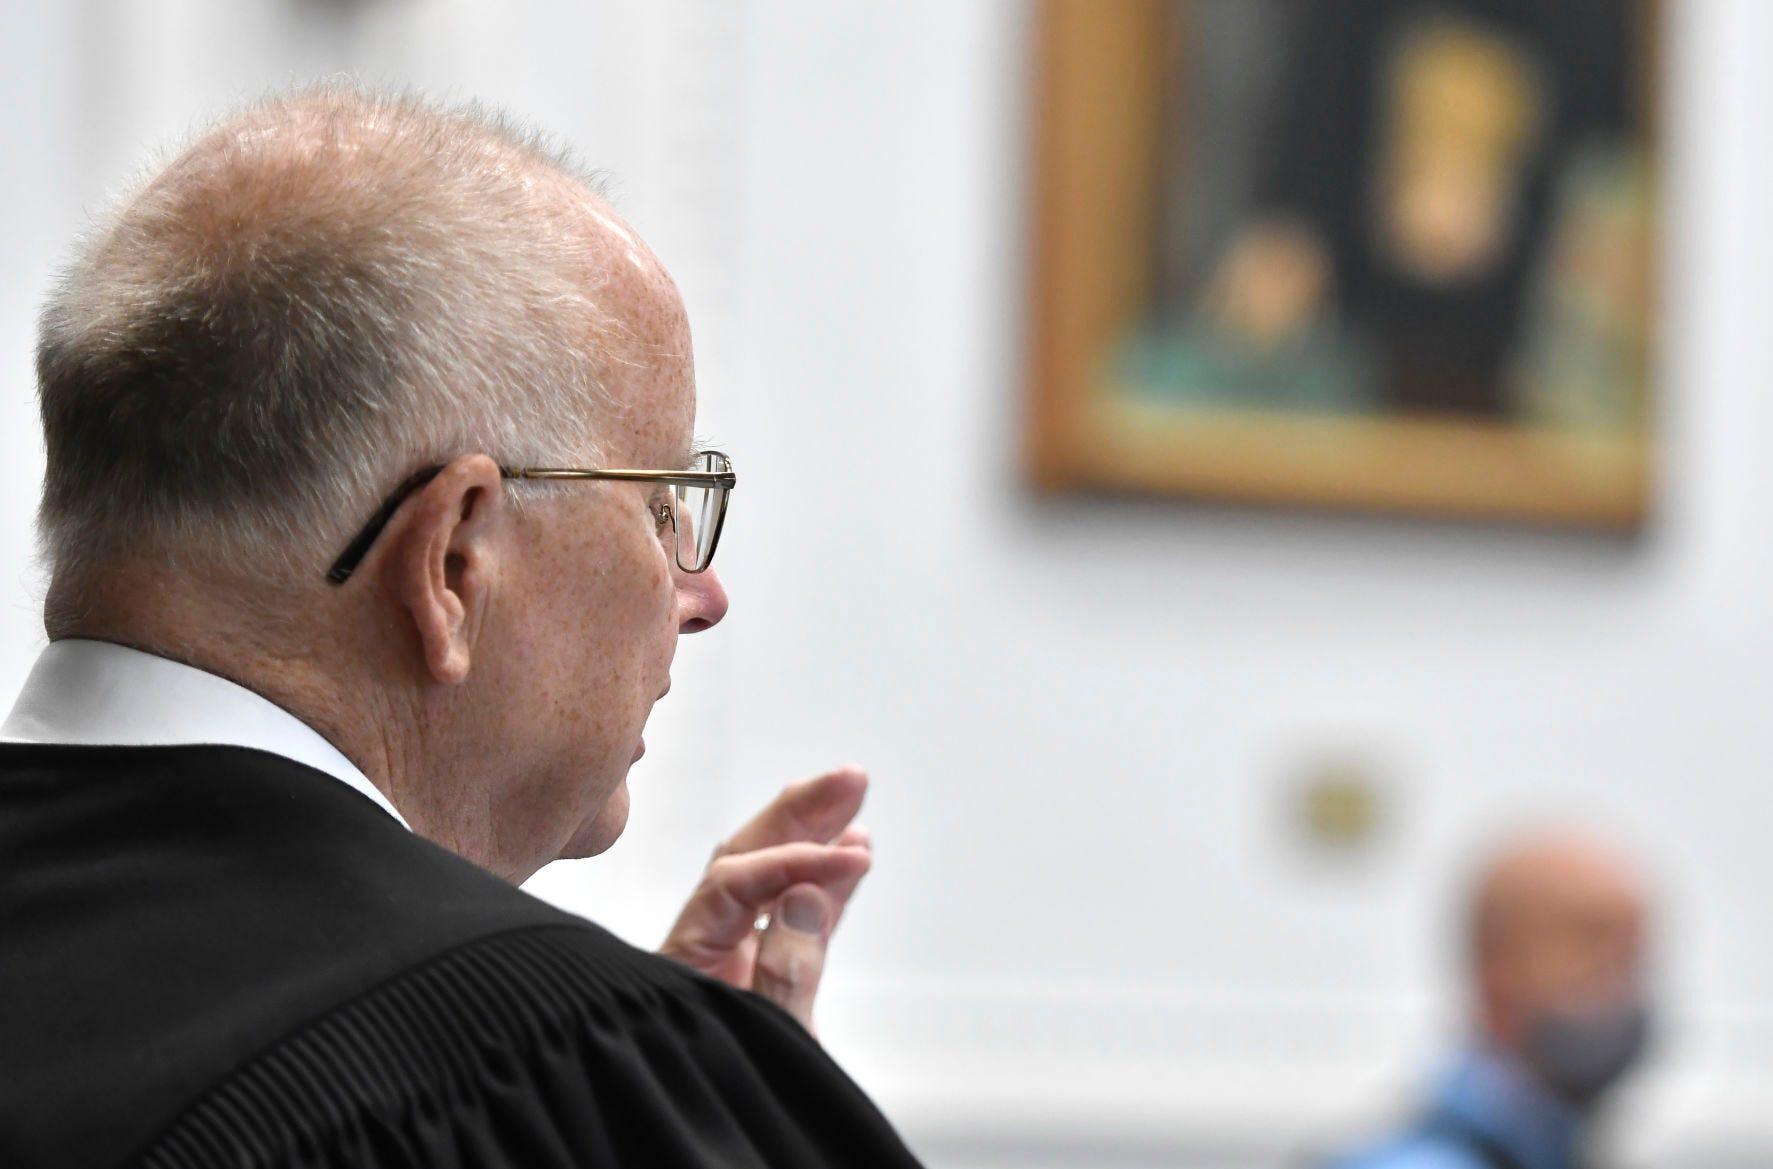 Kenosha County Circuit Court Judge Bruce E. Schroeder speaks during Kyle Rittenhouse's pretrial hearing May 21, 2021 at the Kenosha County Courthouse.